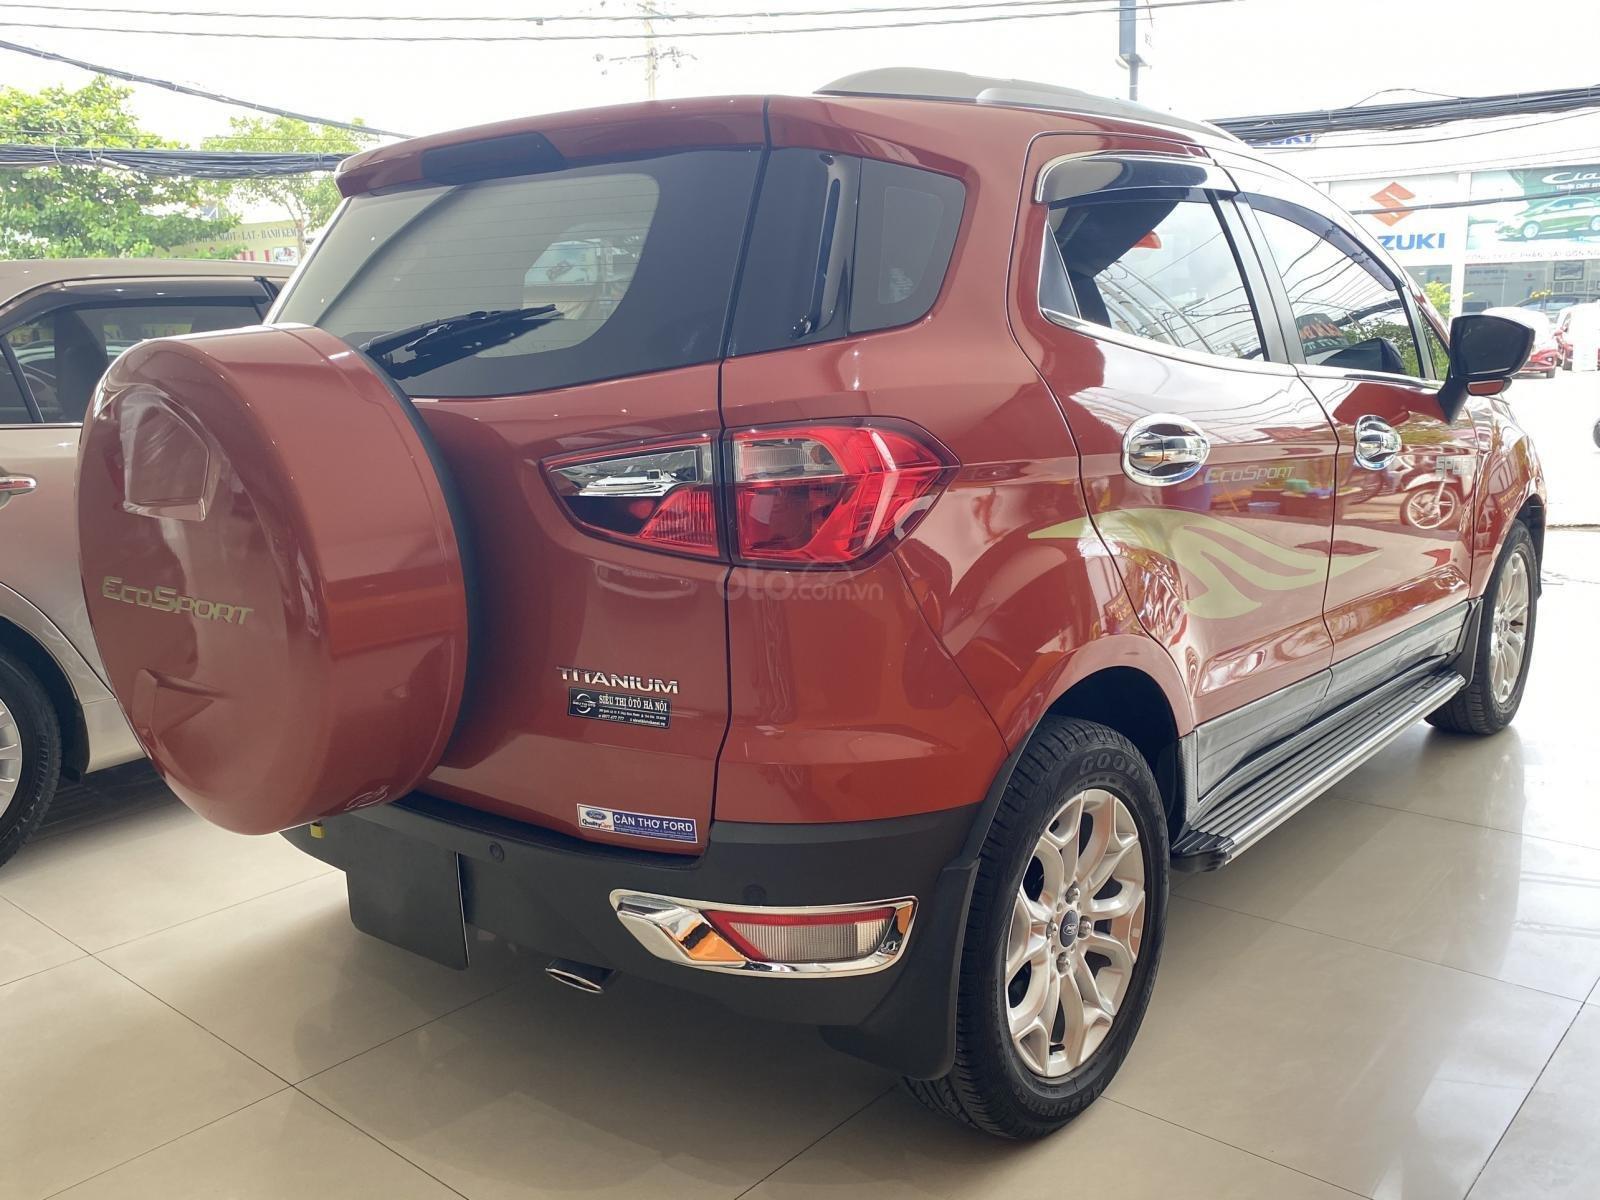 Cần bán Ford Ecosport 1.5 Titanium mẫu mới 2018 (6)